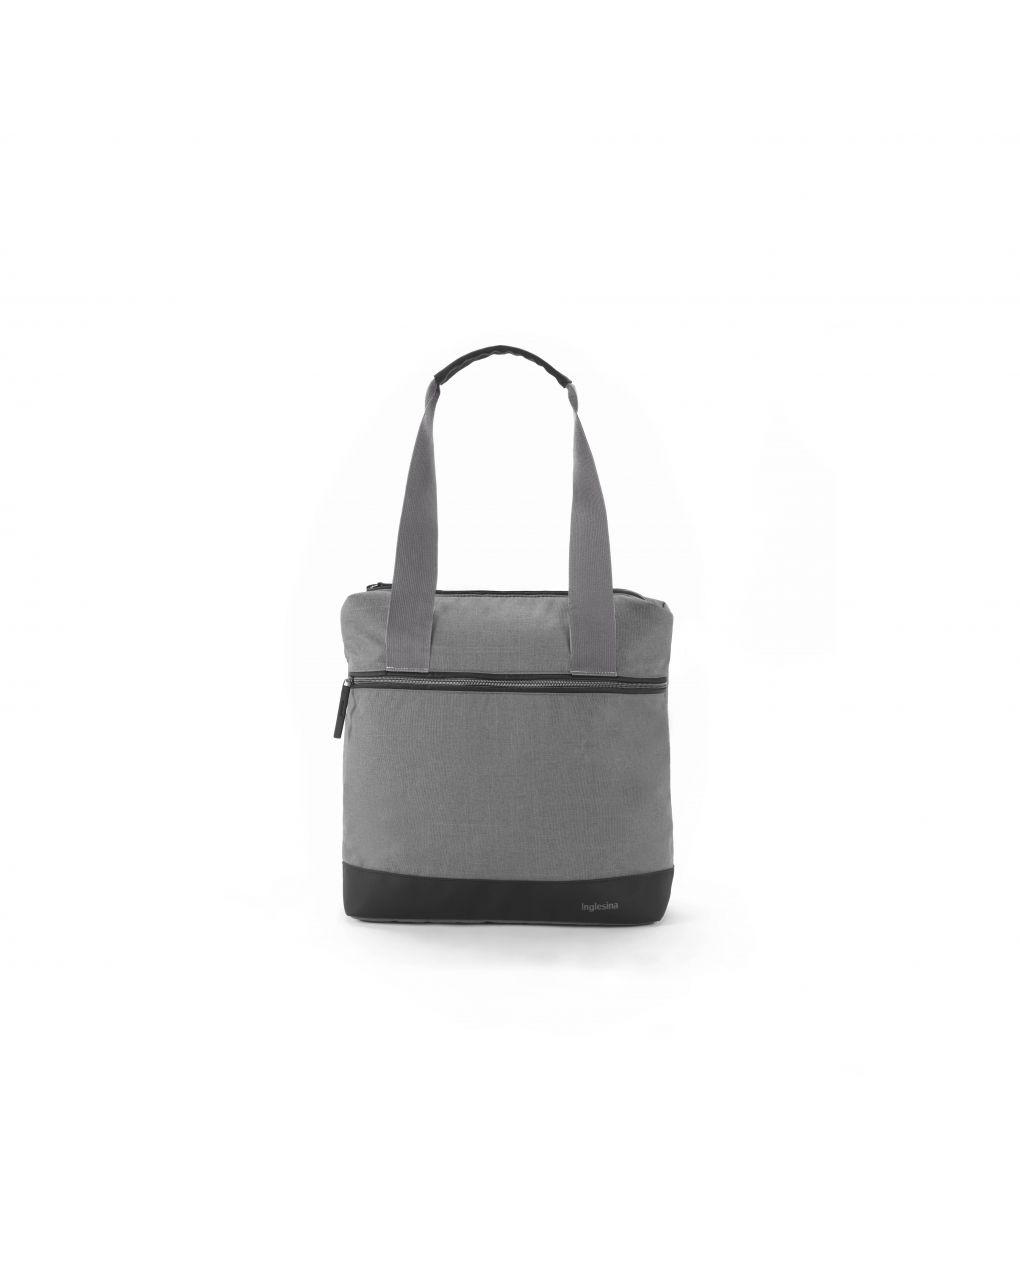 Inglesina Back Bag Aptica Τσάντα Αλλαξιέρα Kensington Grey